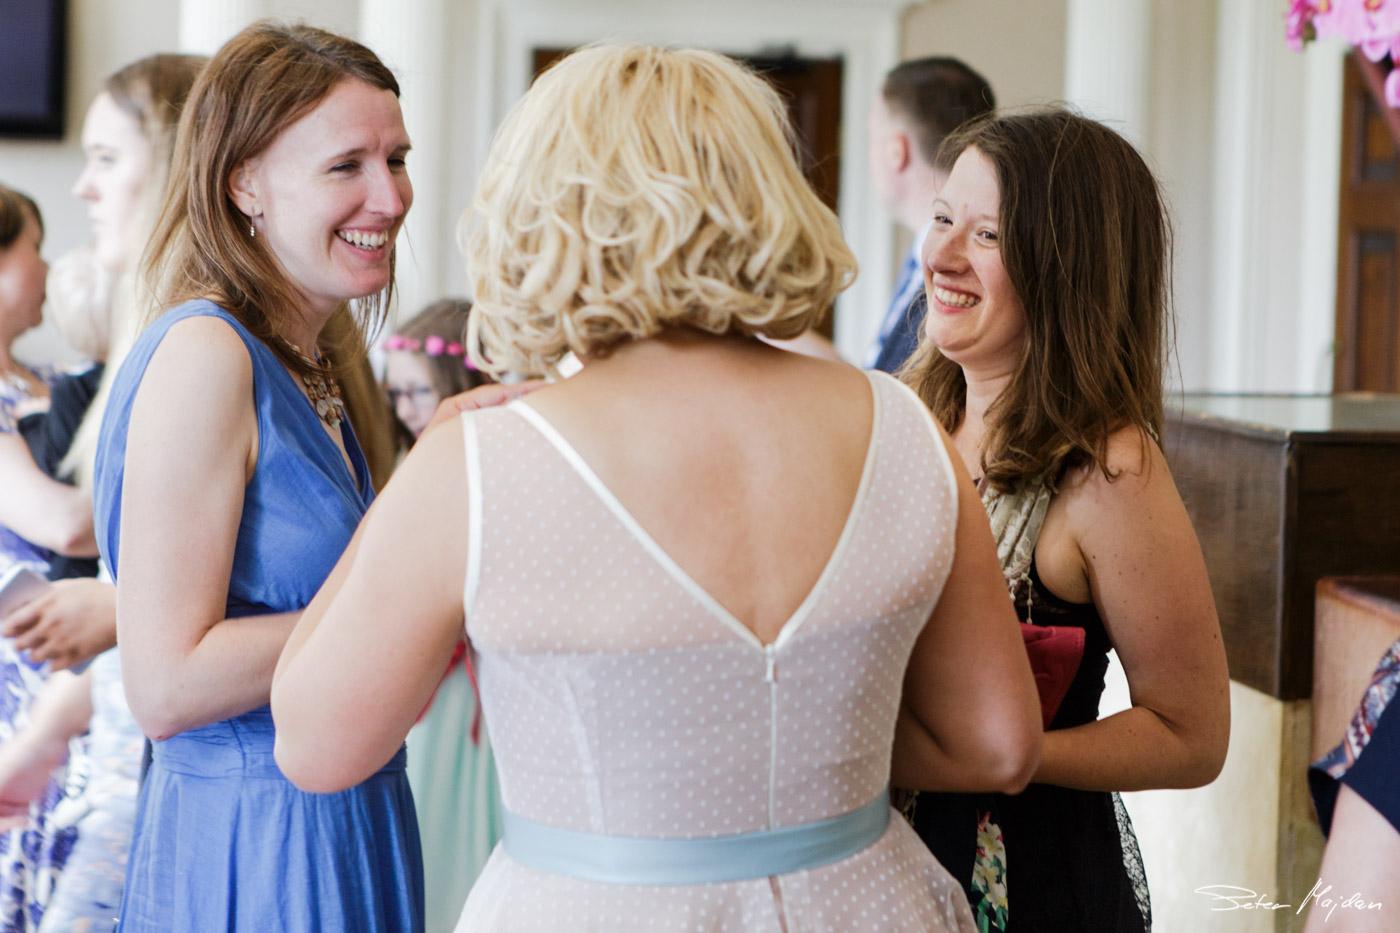 Colwick-hall-wedding-photography-56.jpg